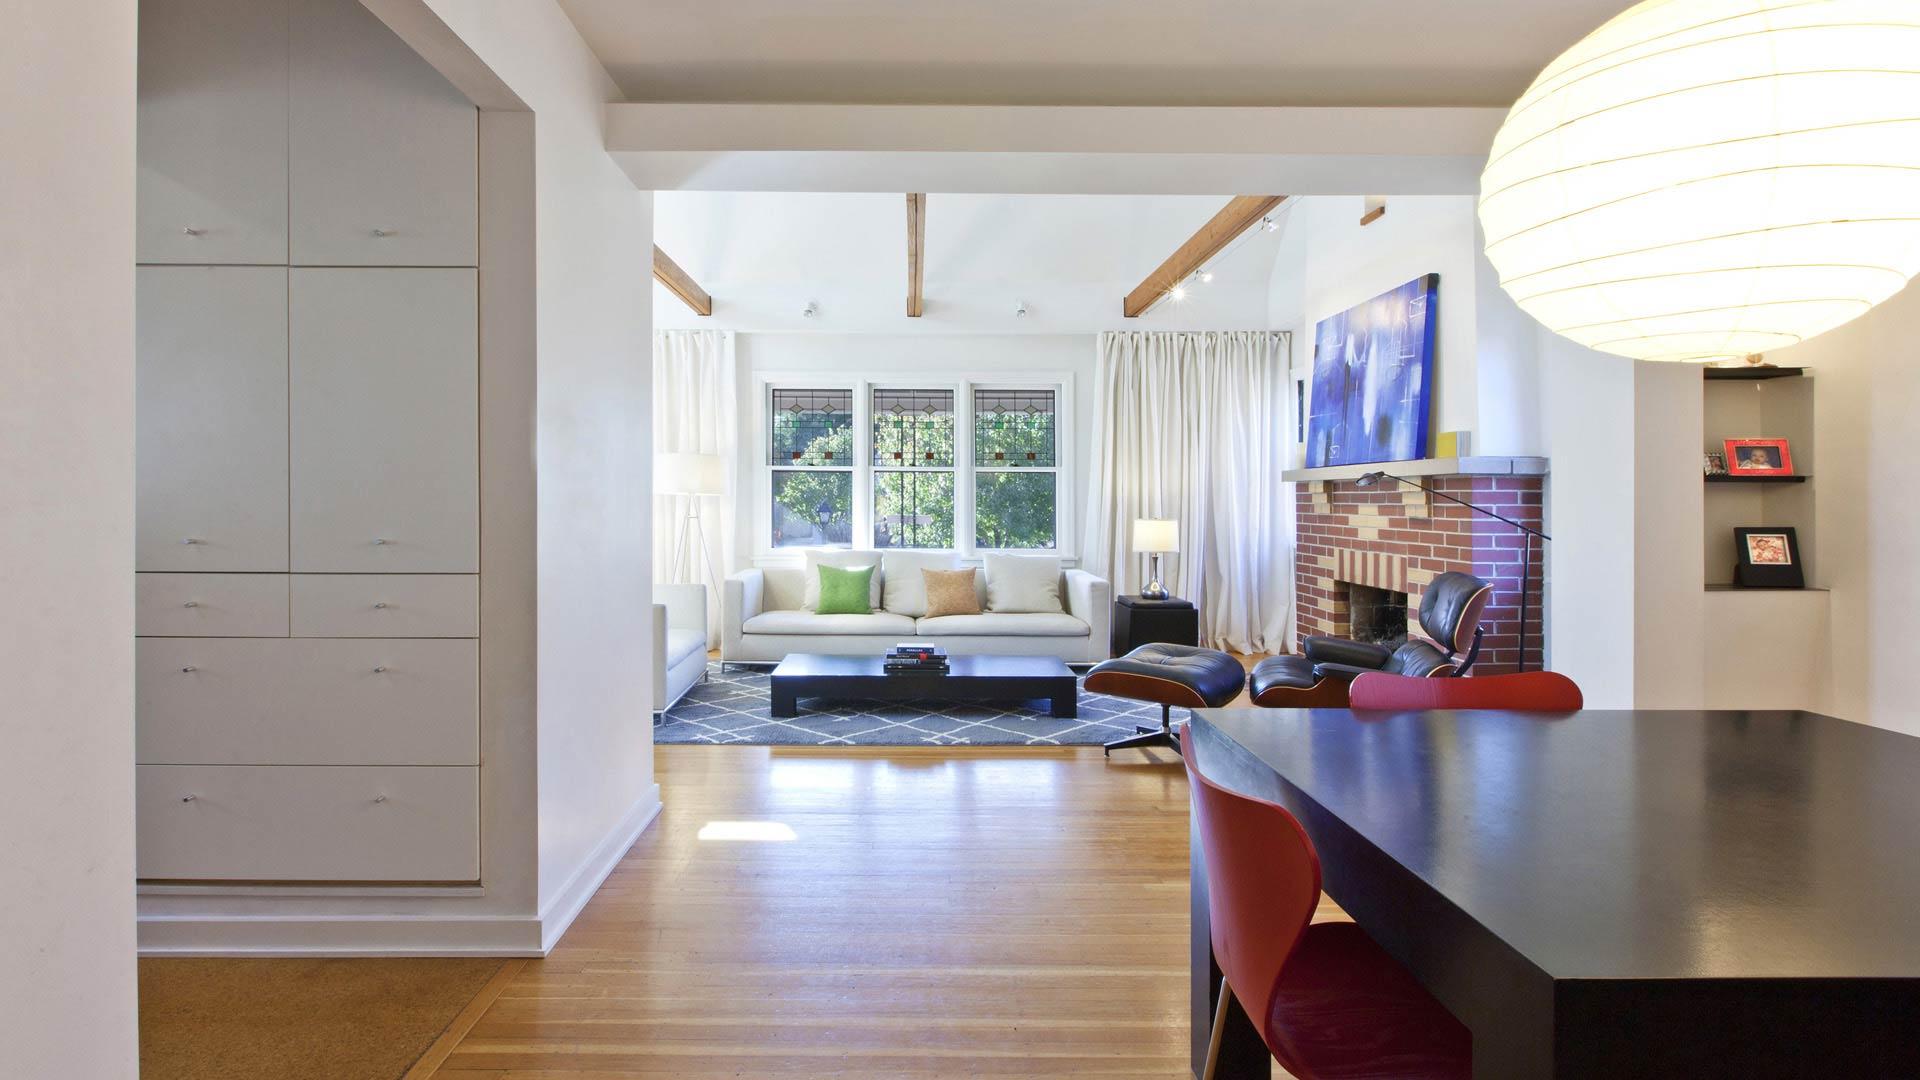 Classic Irvington Tudor Remodel - Dining Living - Christopher Short, Architect, Indianapolis, HAUS Architecture